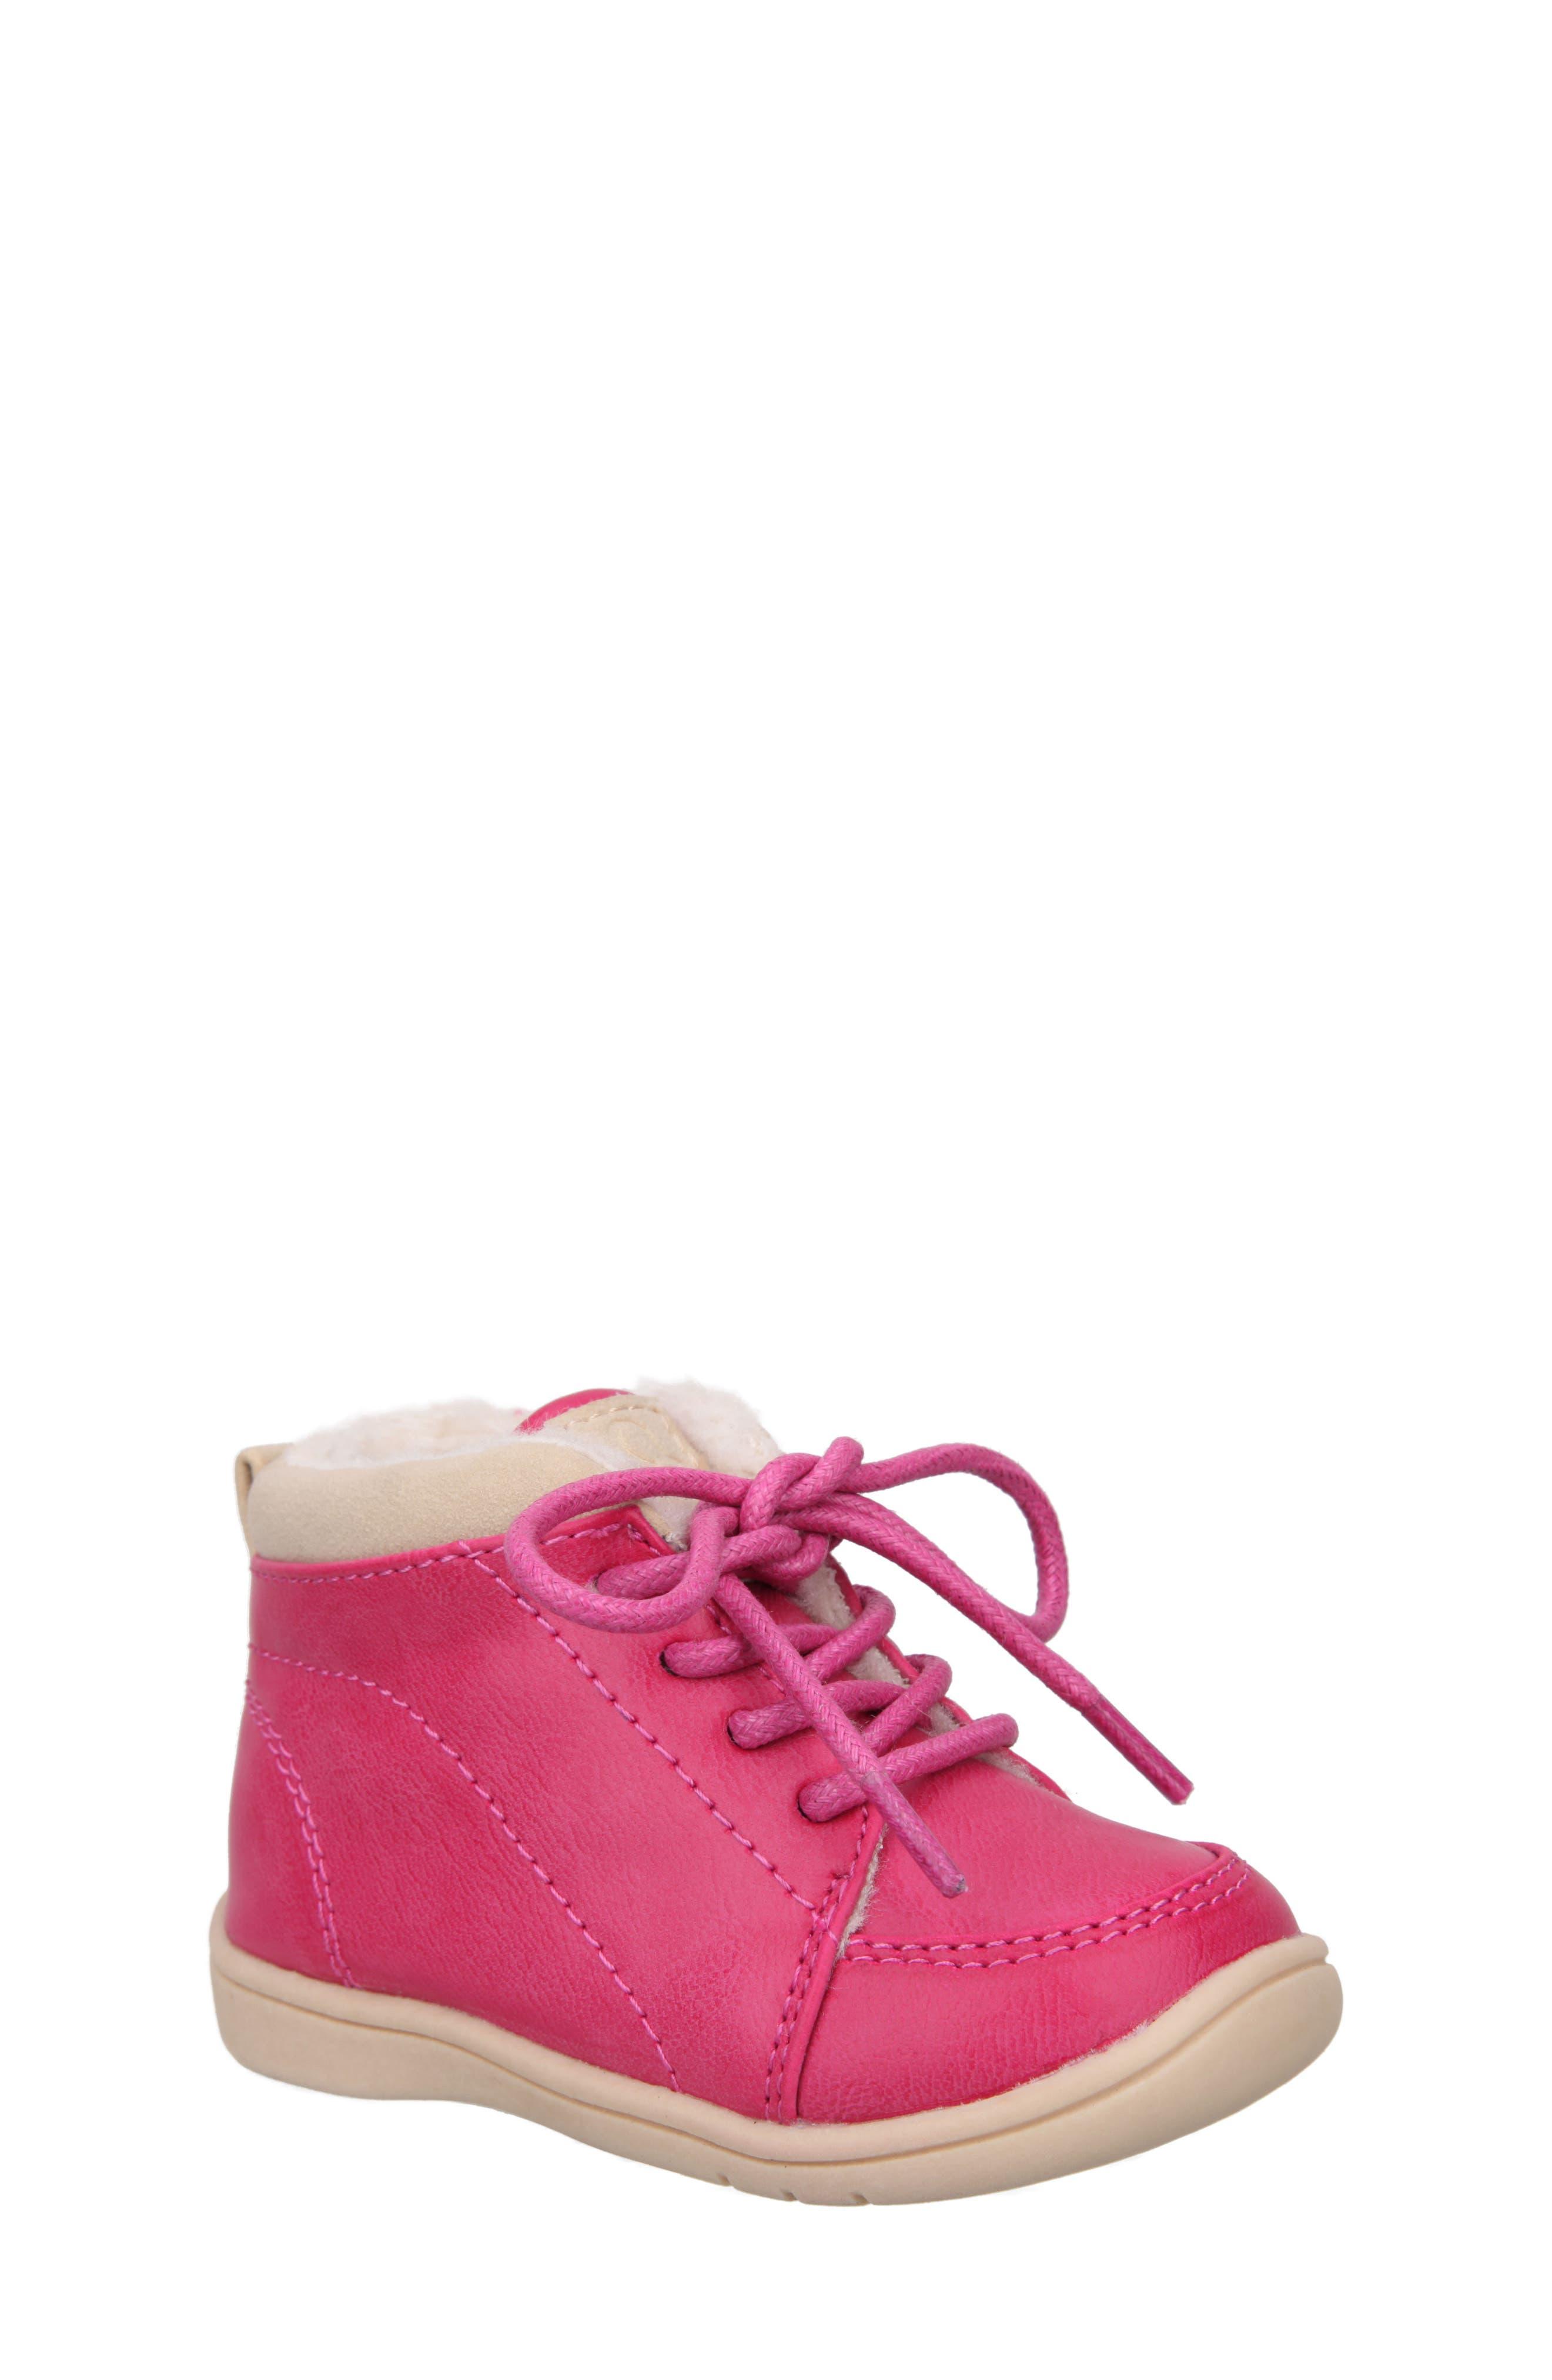 Alternate Image 1 Selected - Nina Mobility Moe Sneaker (Baby & Walker)